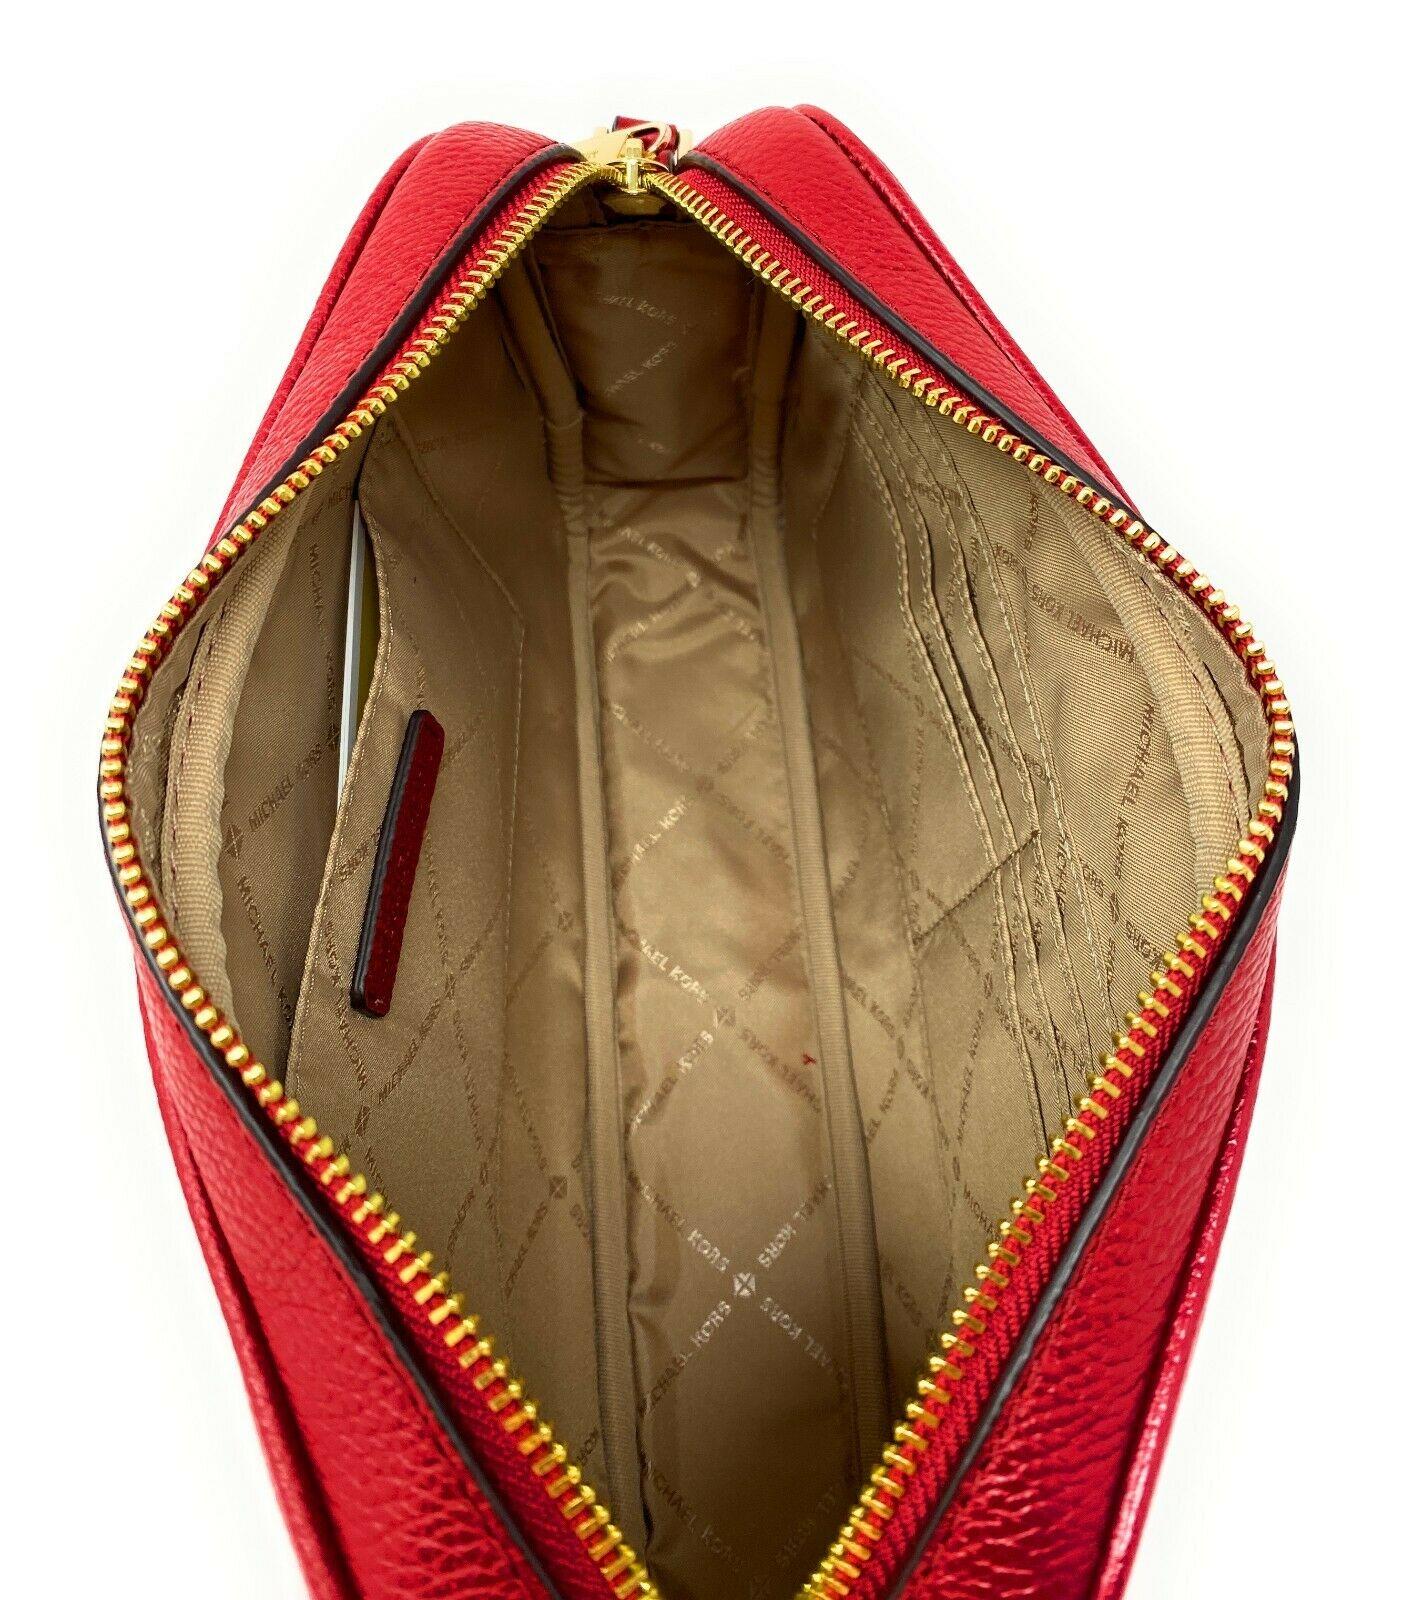 thumbnail 31 - Michael Kors Jet Set Item Large East West Crossbody Chain Handbag Clutch $298